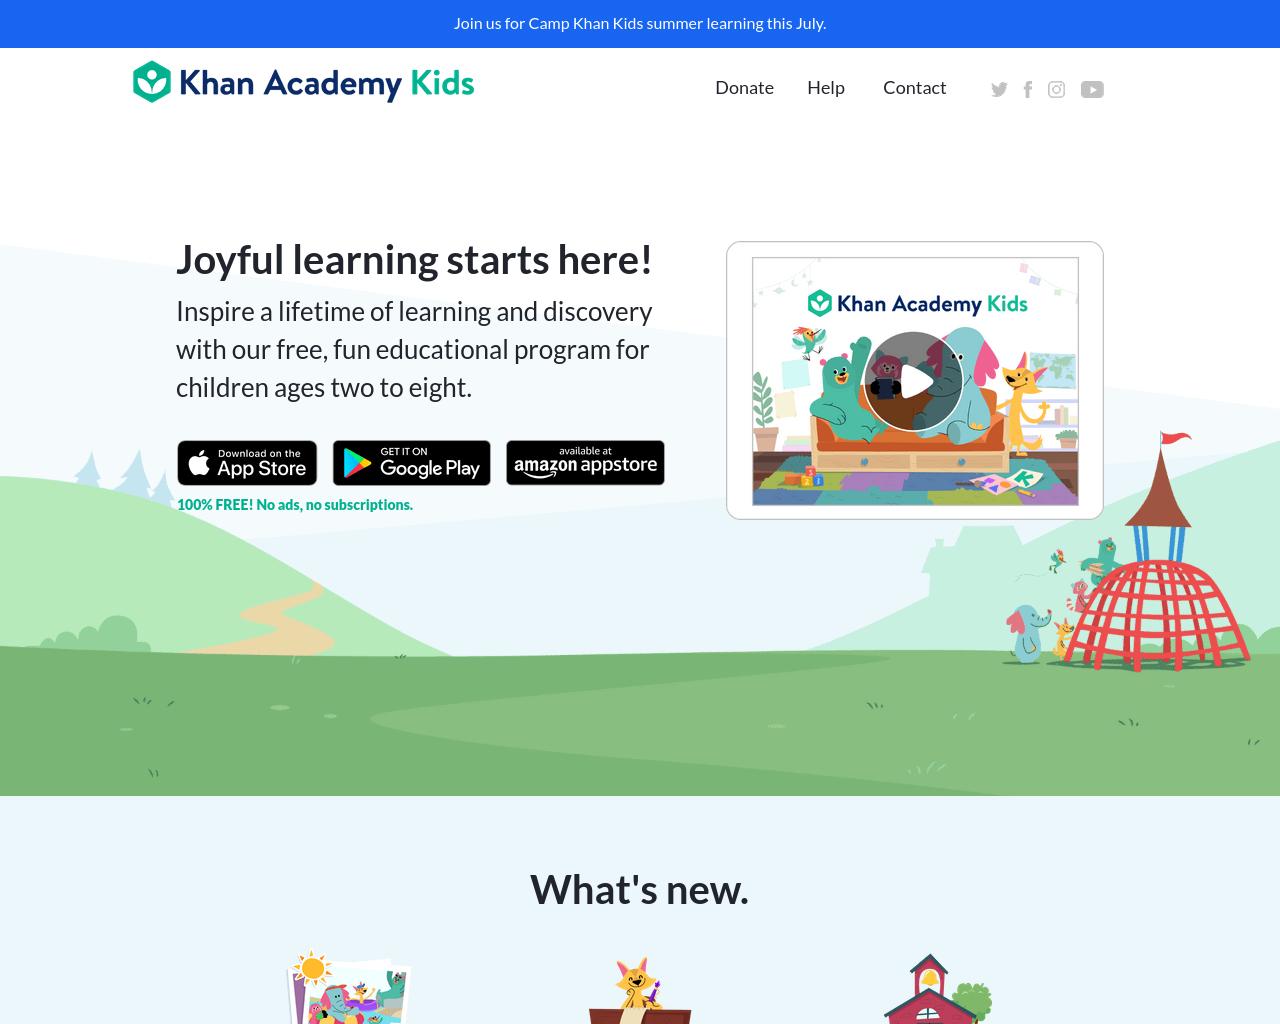 Kahn Academy Kids